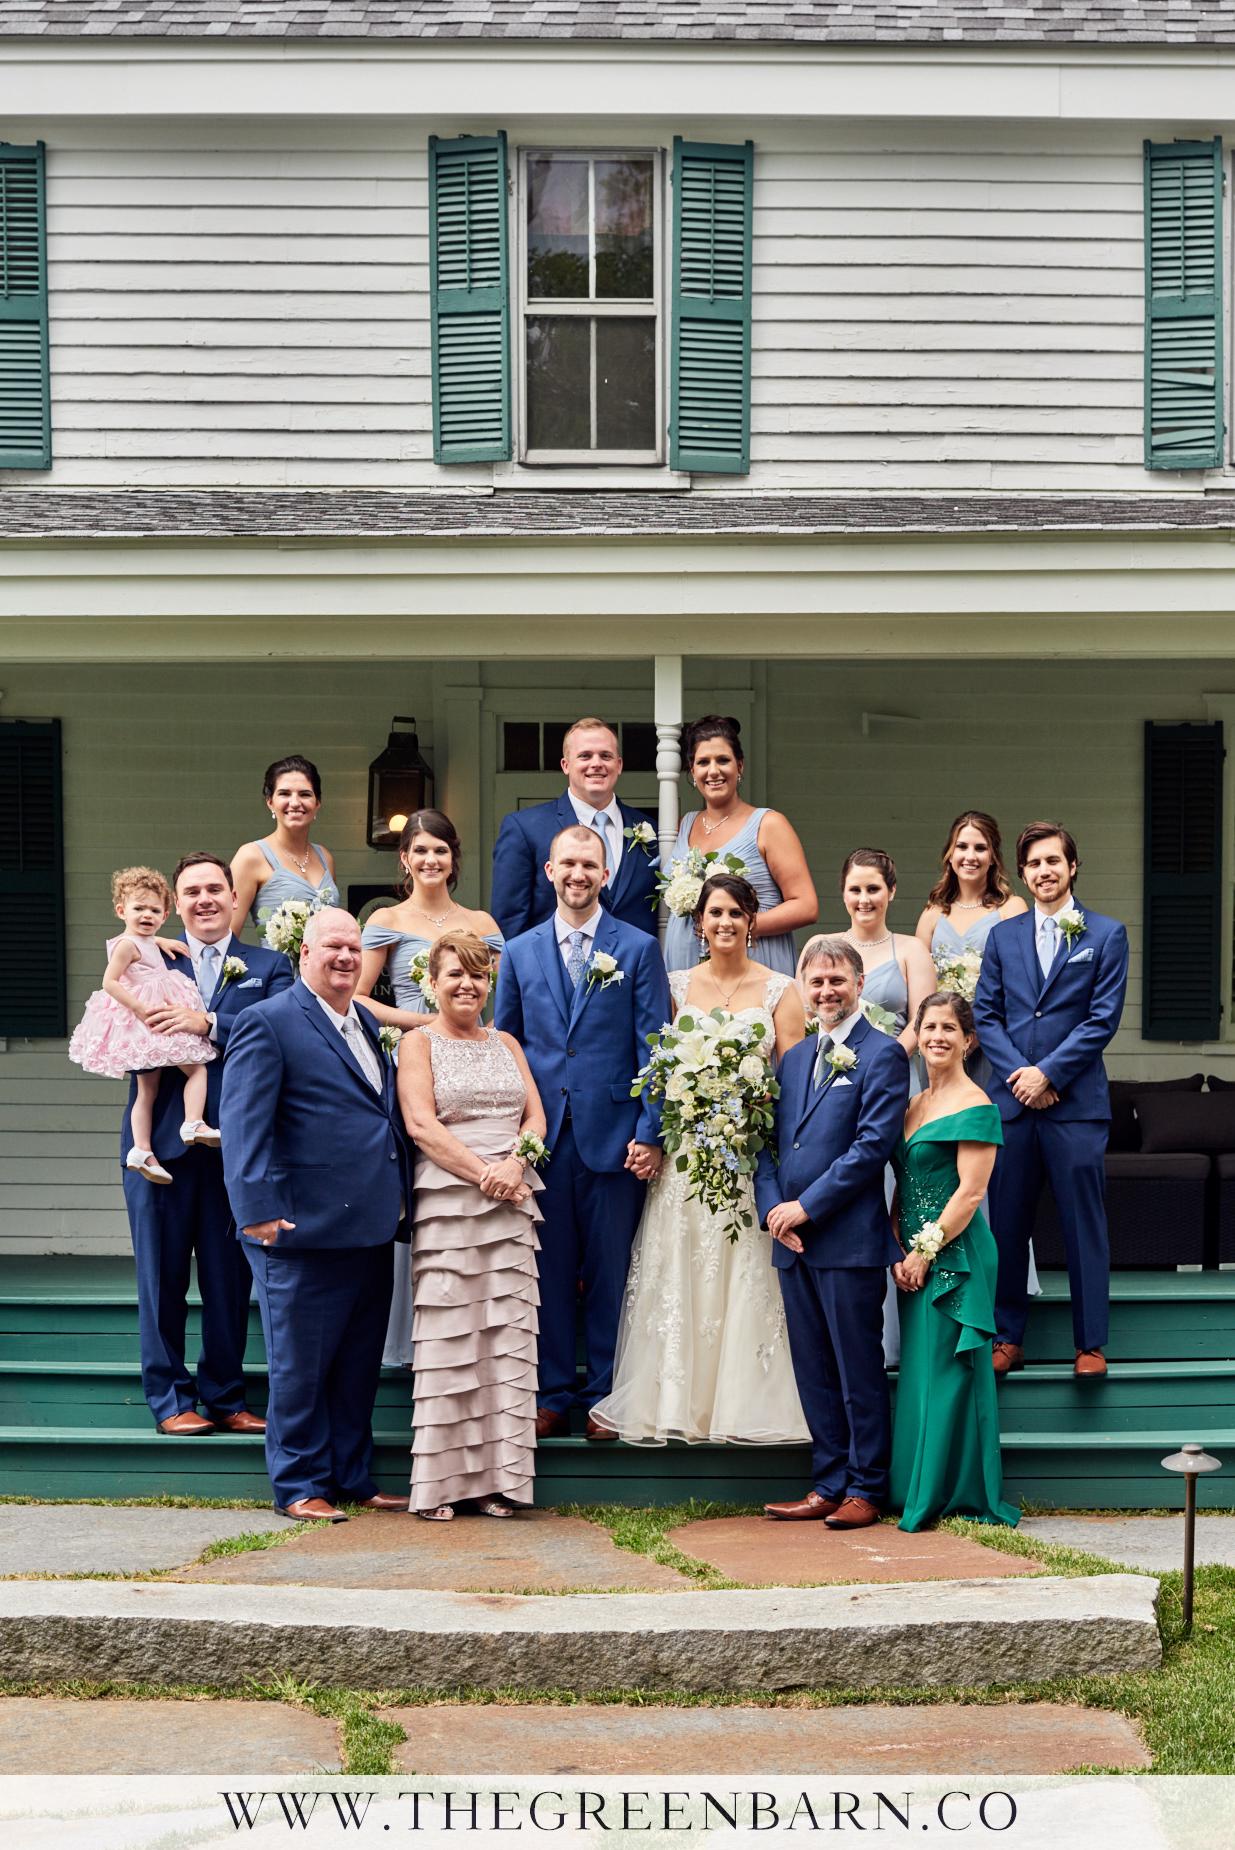 Family Portrait at a Farmhouse Wedding at Harrington Farm Photo by Cate Bligh of The Green Barn Wedding Photography LLC